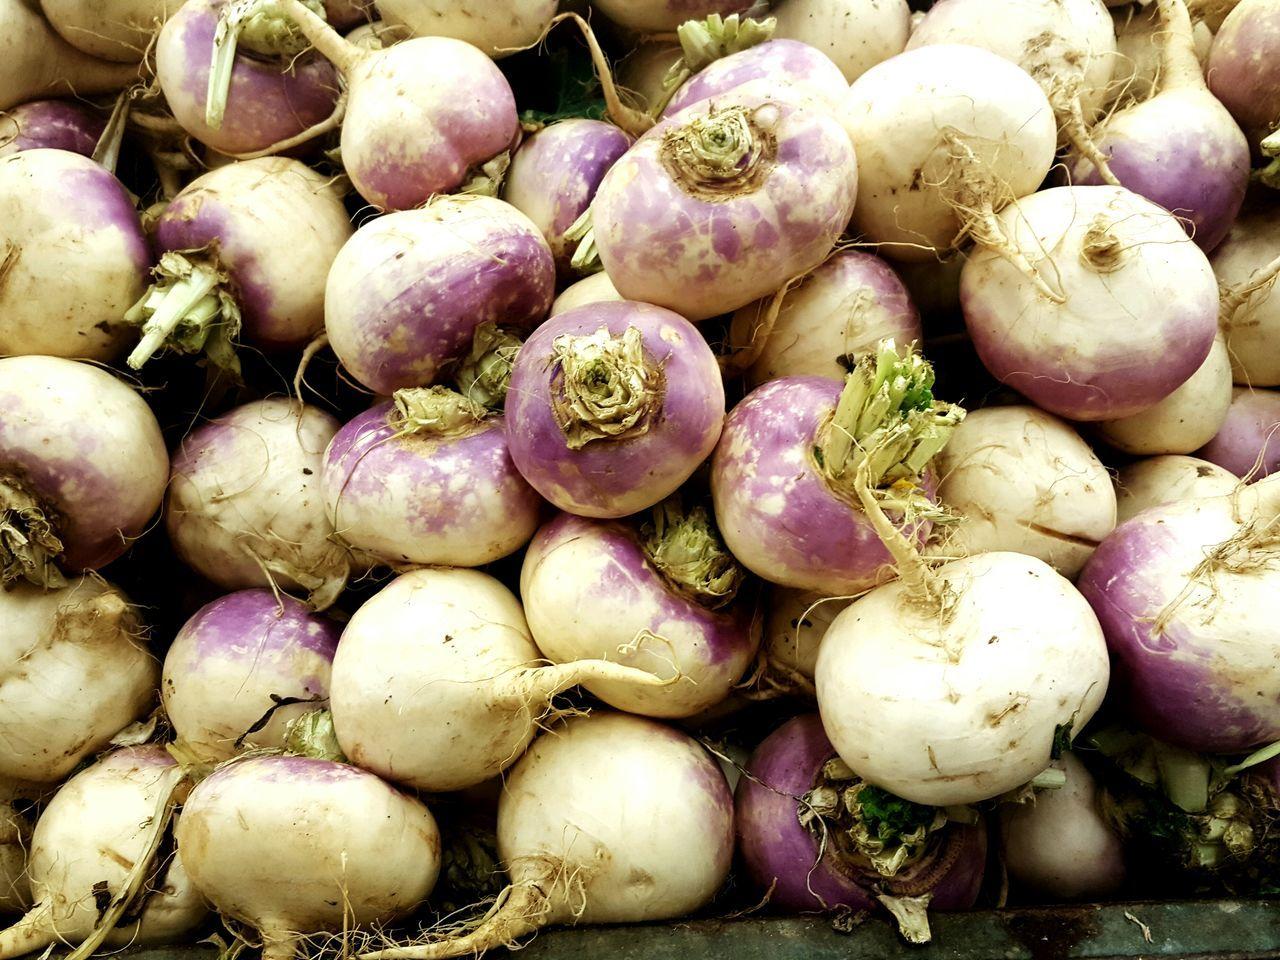 Freshness Food Food And Drink Market Vegetable Market Stall Farmer Market Day No People Radish